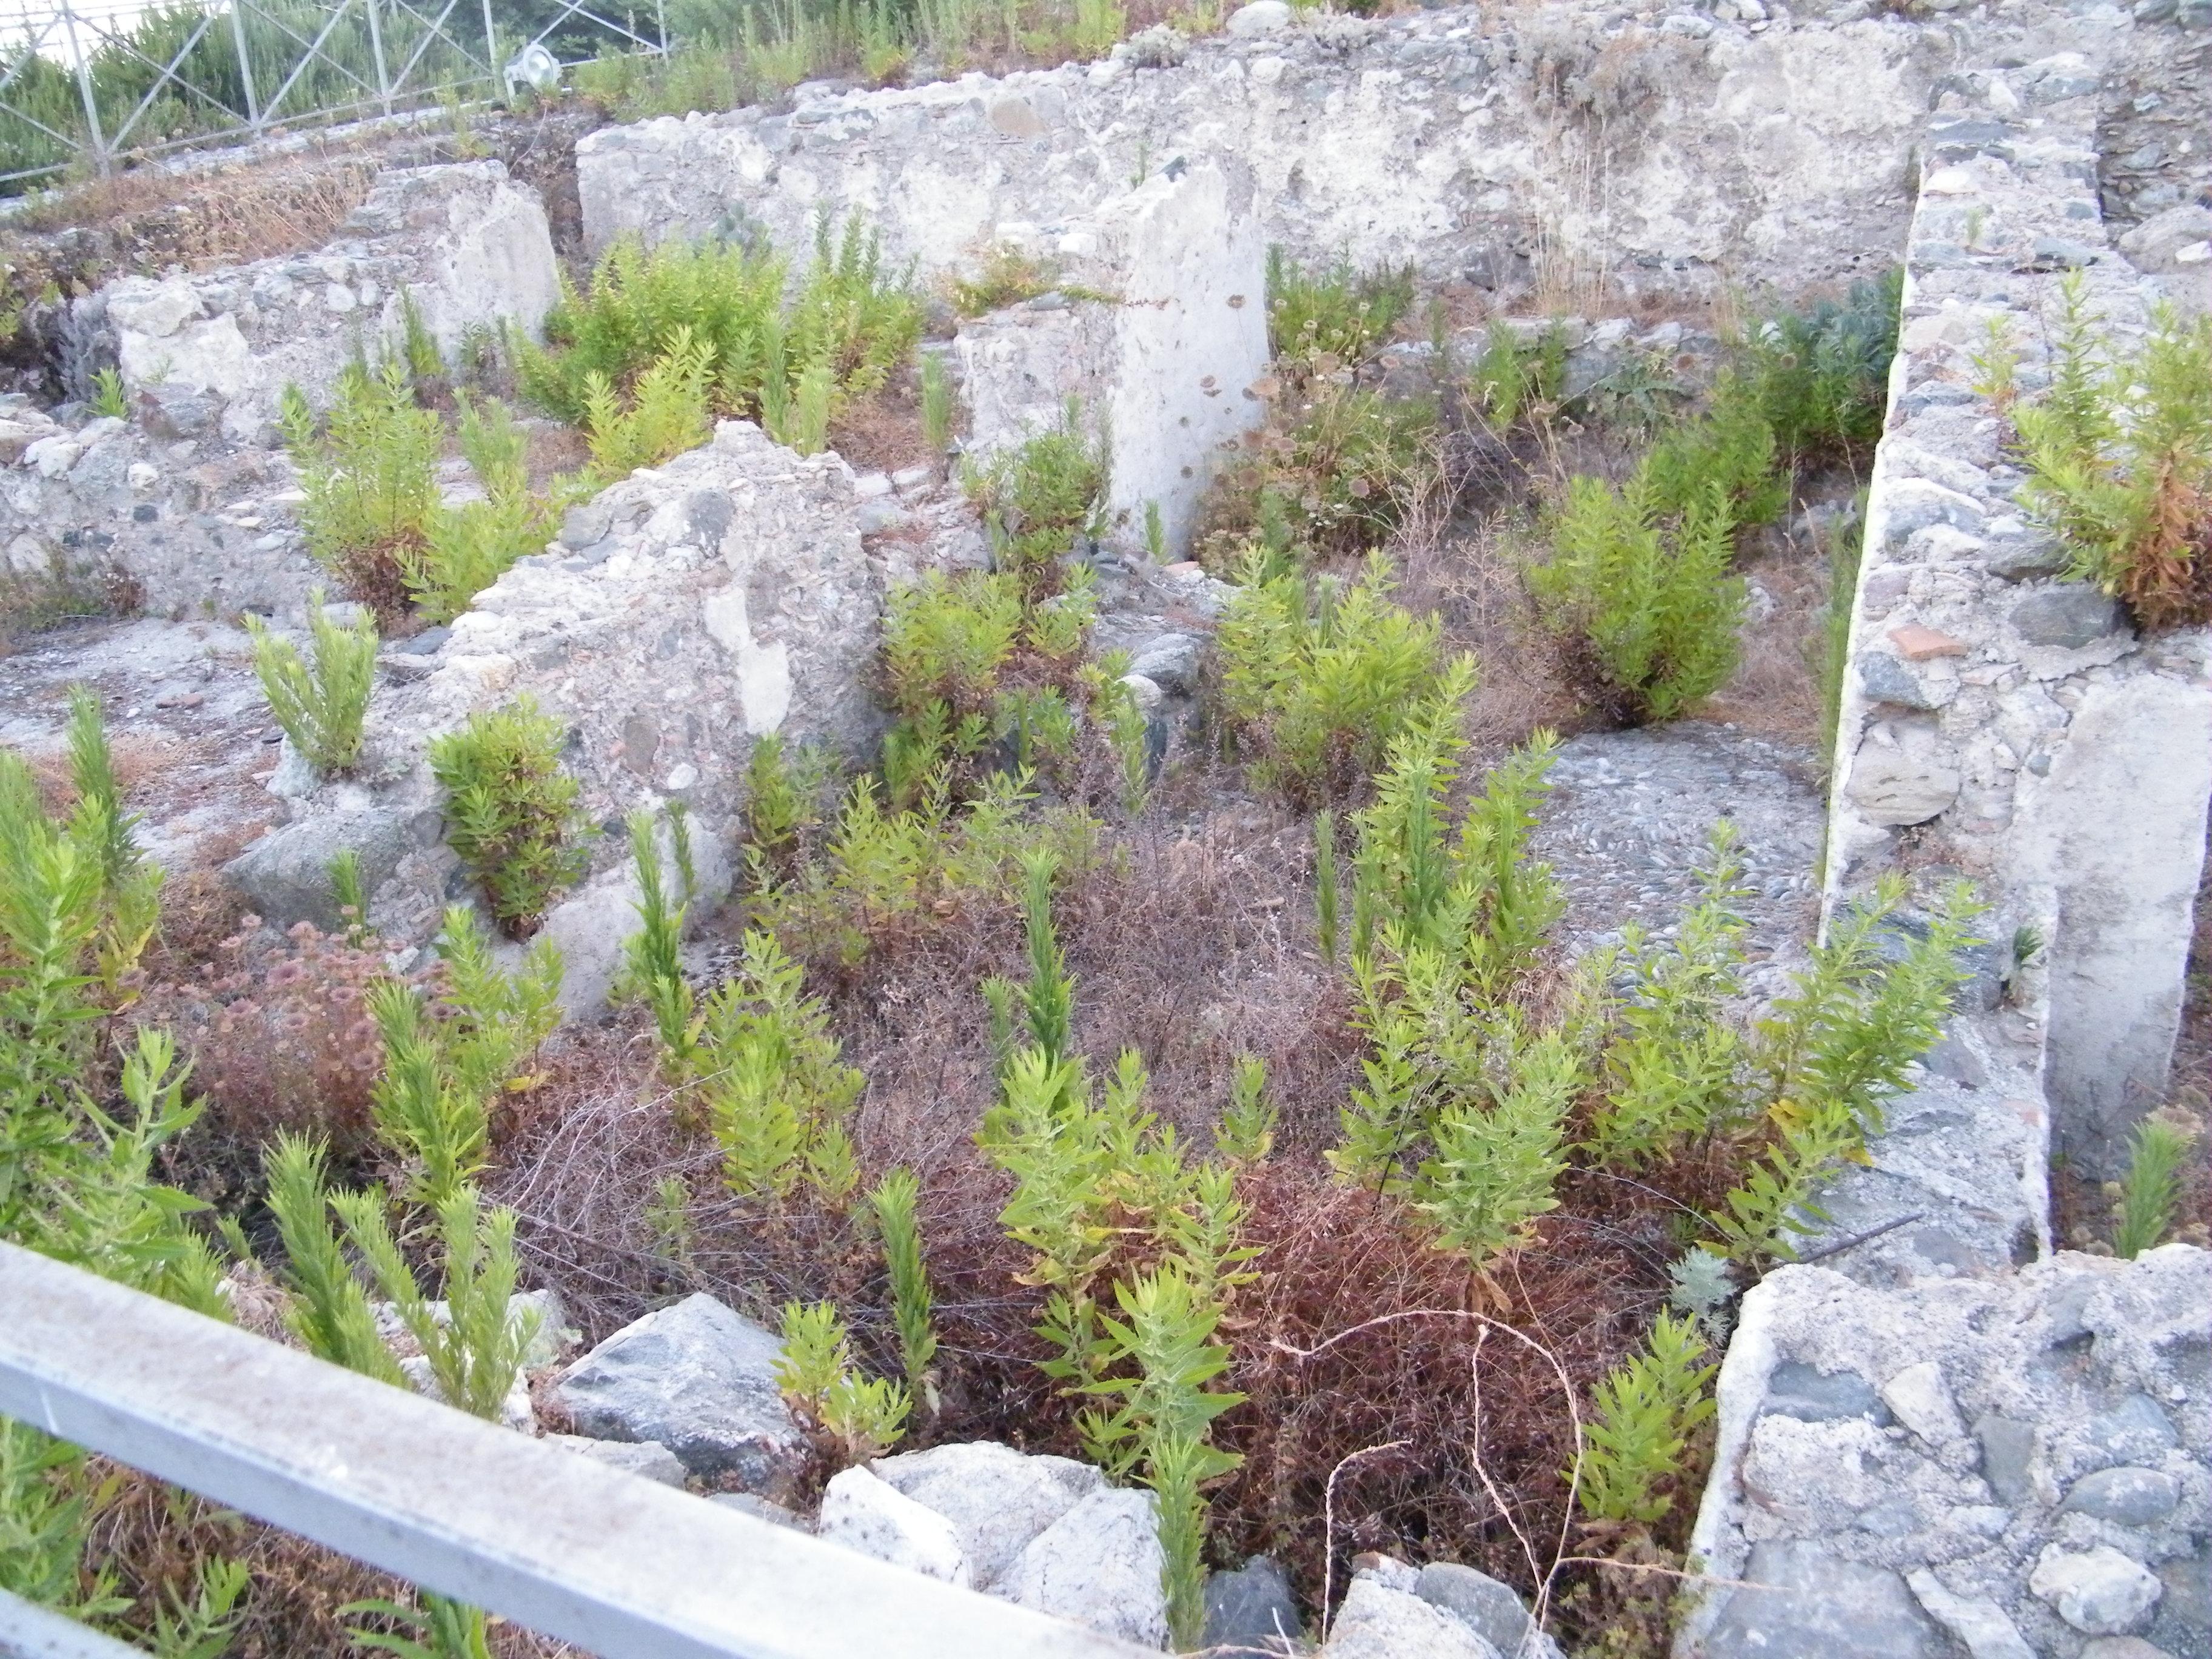 erbacce negli scavi archeologici